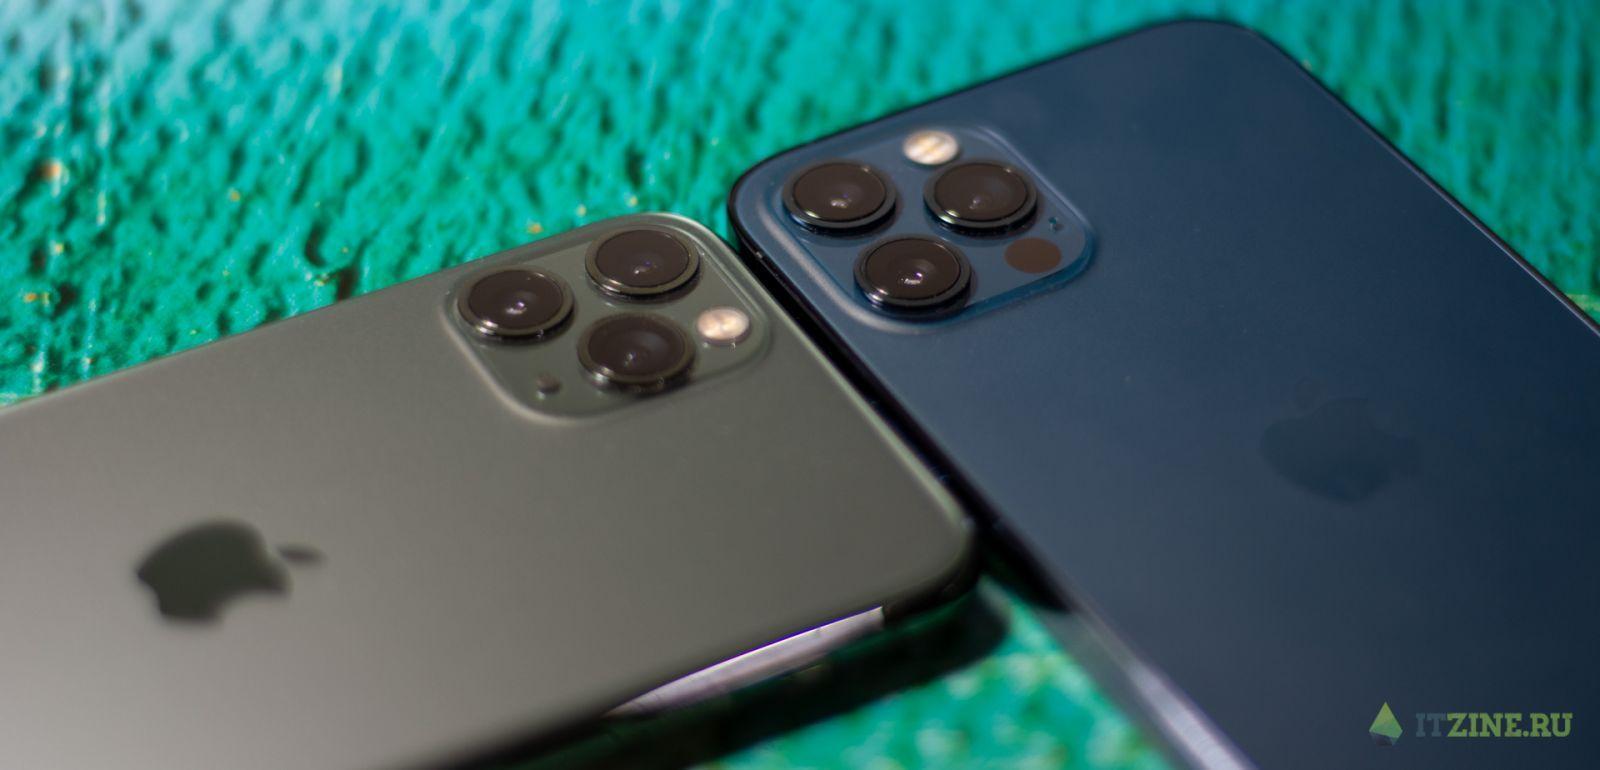 Зелёный iPhone 11 Pro и синий iPhone 12 Pro